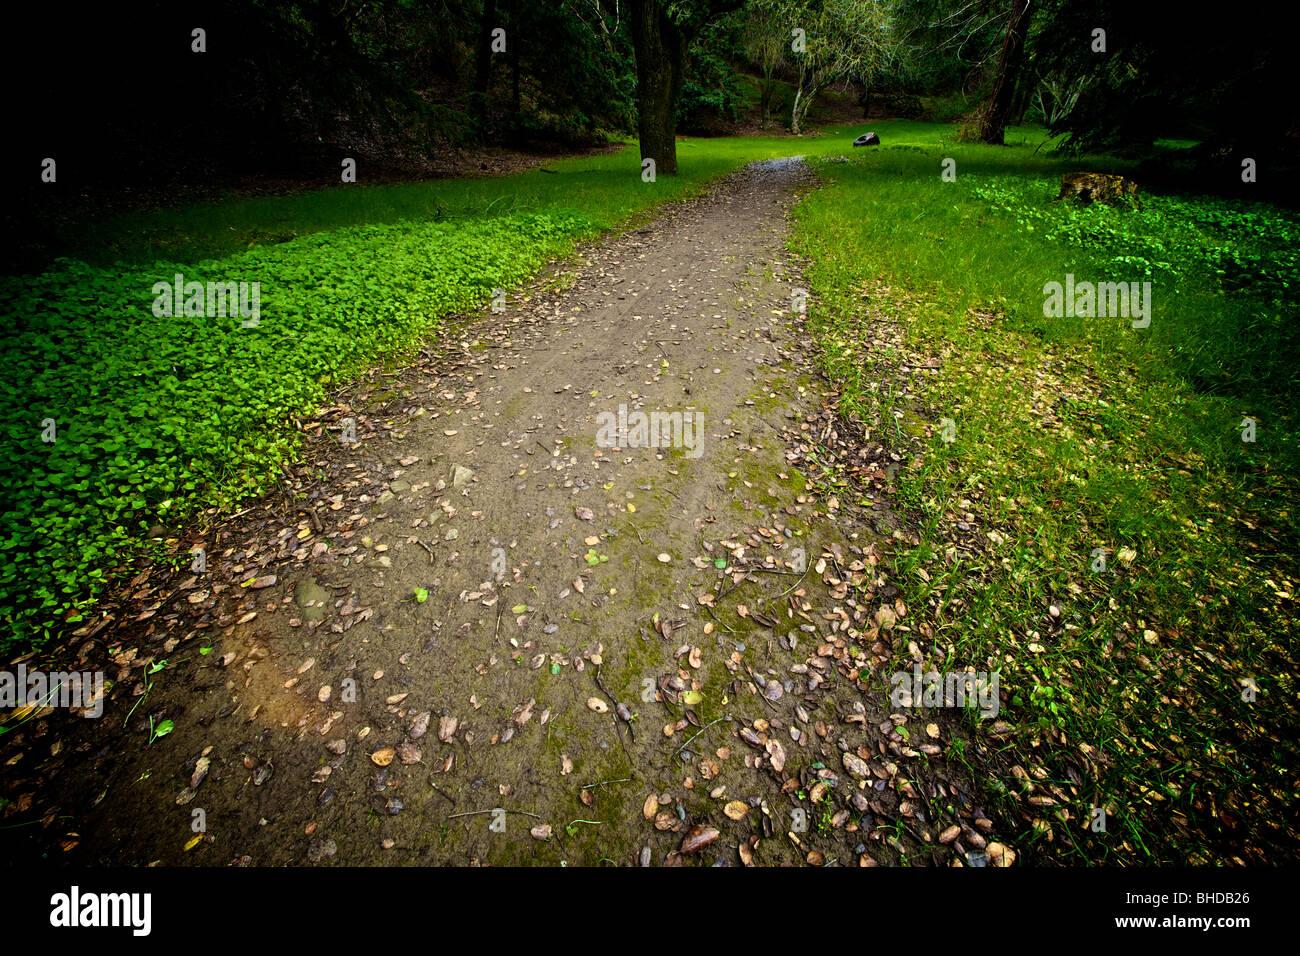 A dirt trail in Alum Rock Park, San Jose, CA - Stock Image